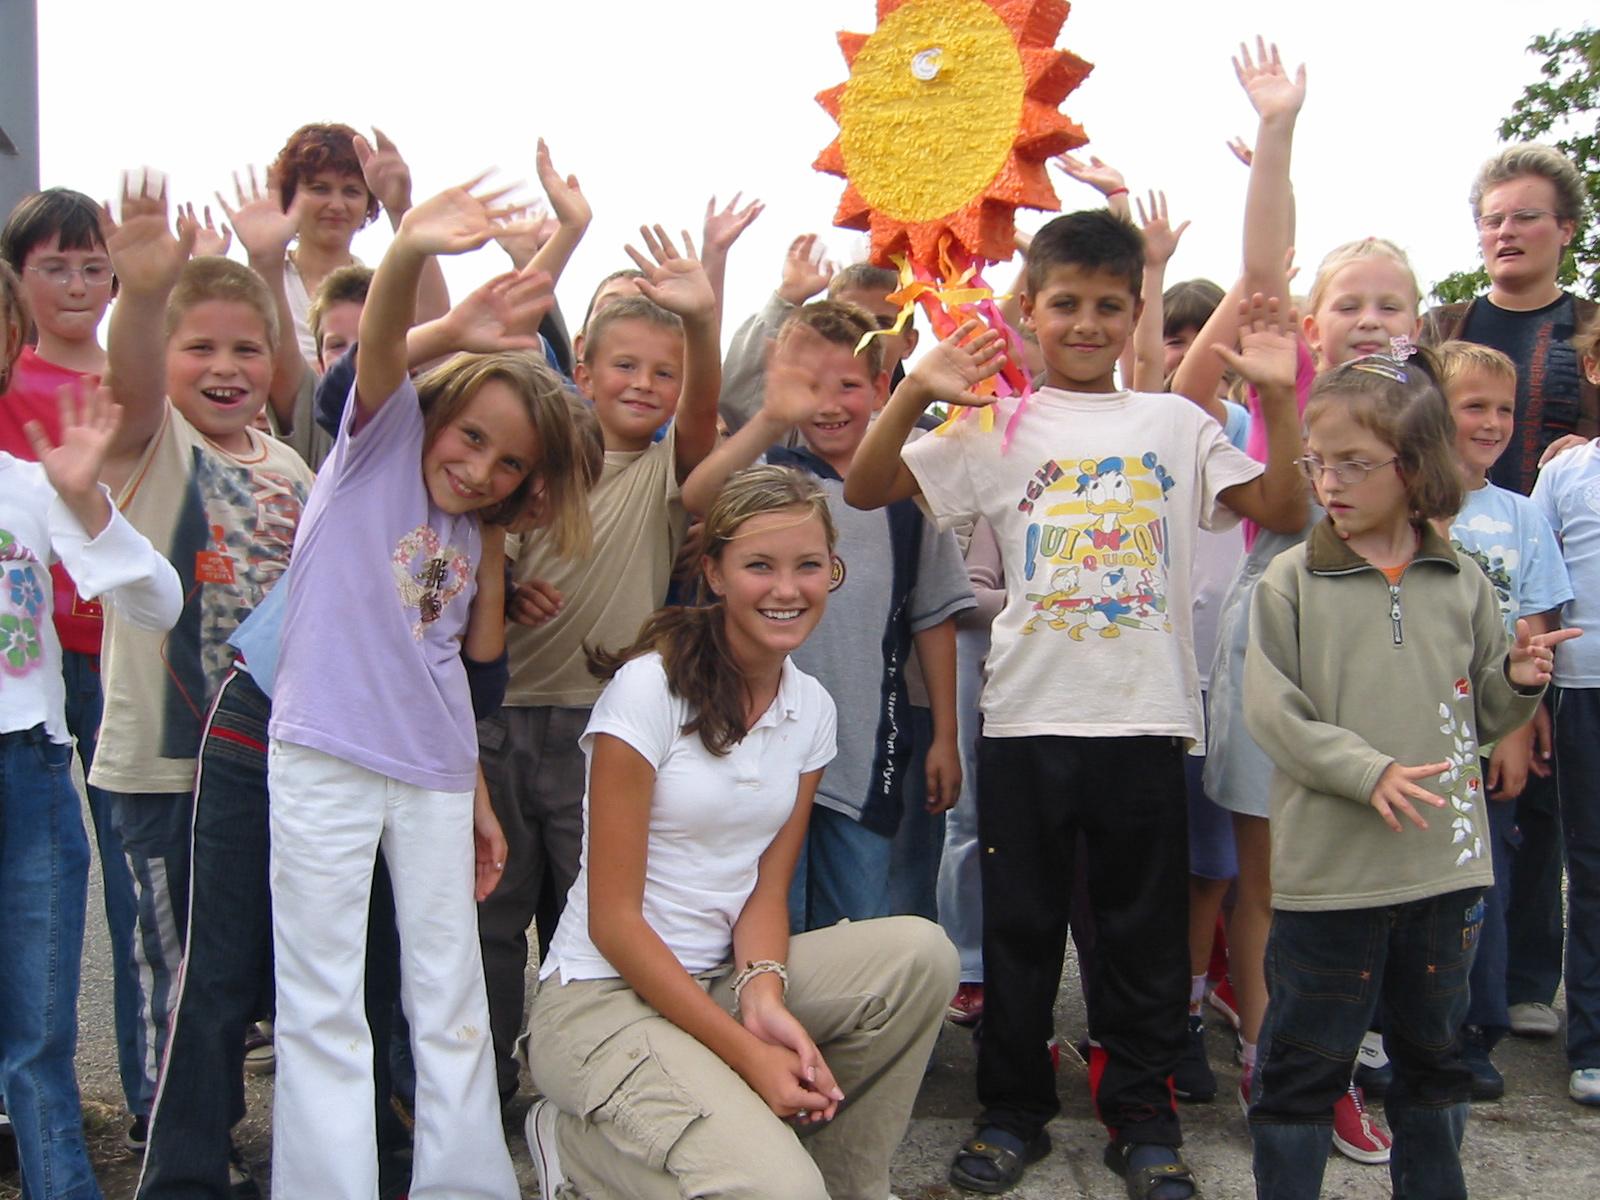 Croatia-children-school-pinata-Kyleigh-Kuhn-Roots-of-Peace-ROP-waving-kids-smiling.jpg